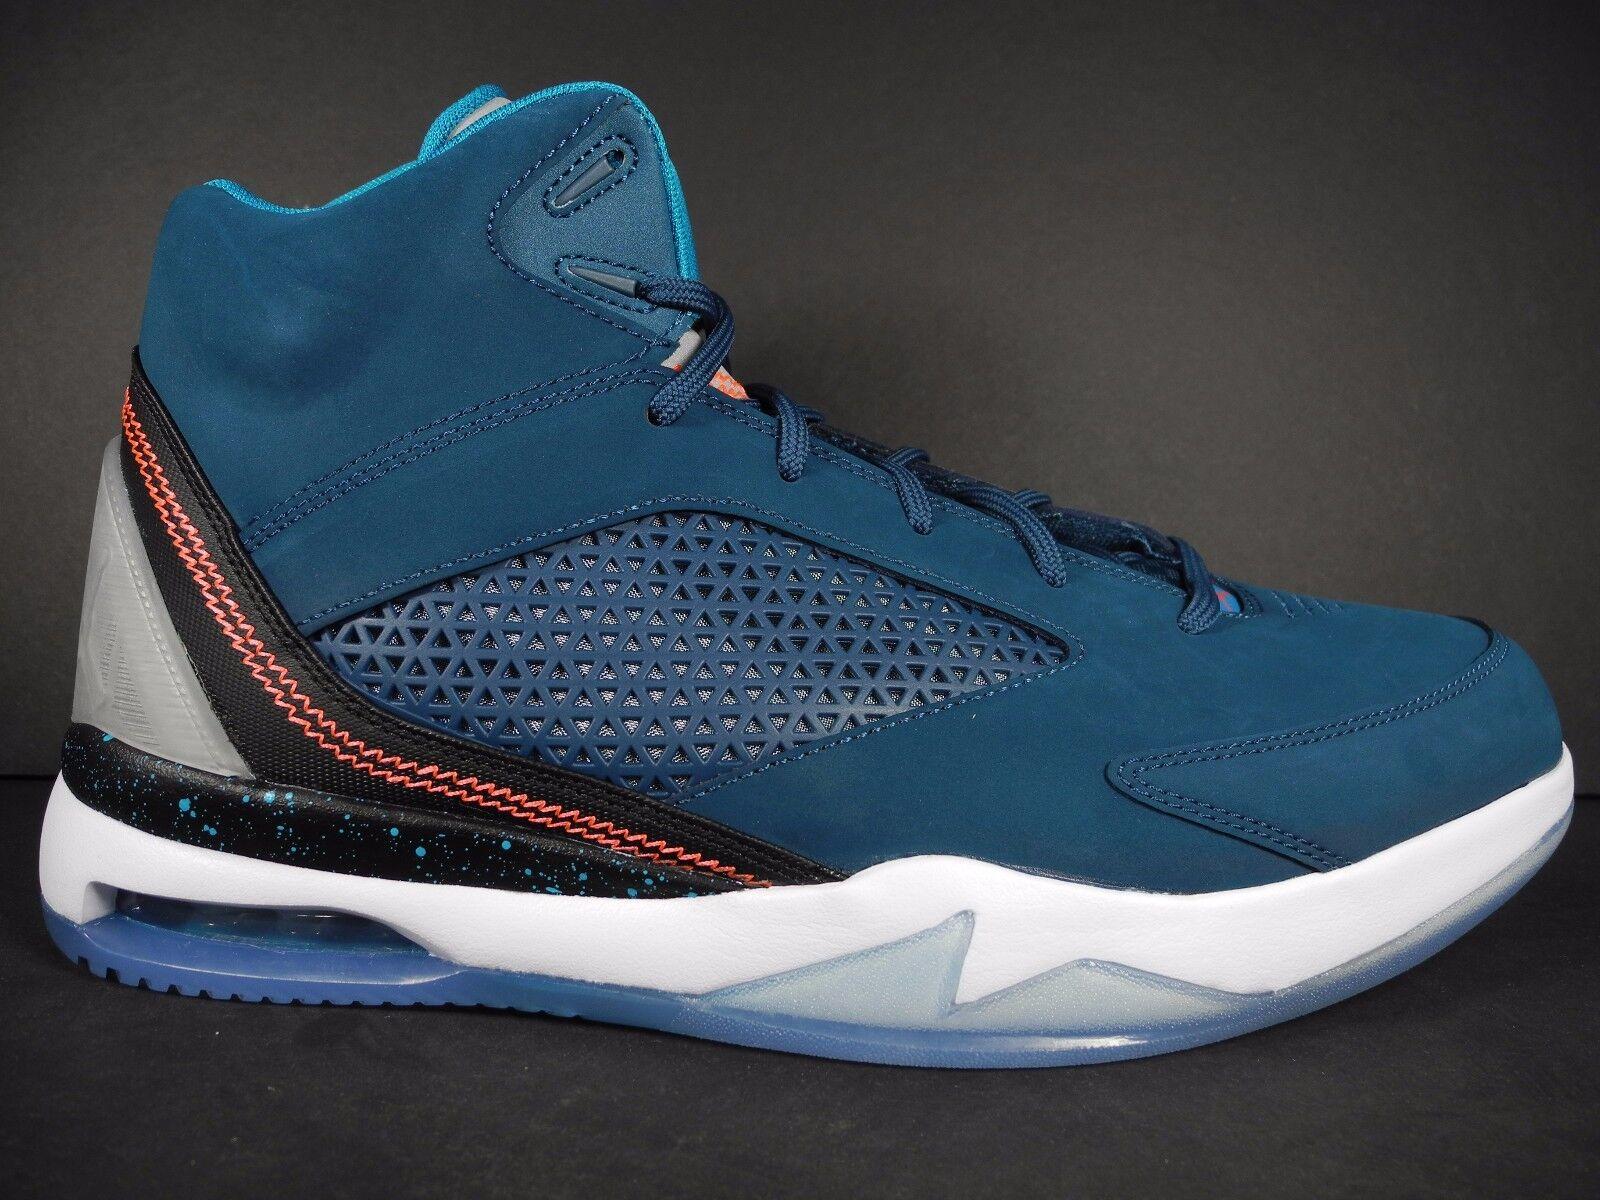 NEW Nike AIR JORDAN FLIGHT REMIX Men's Basketball Shoes Size US 10.5